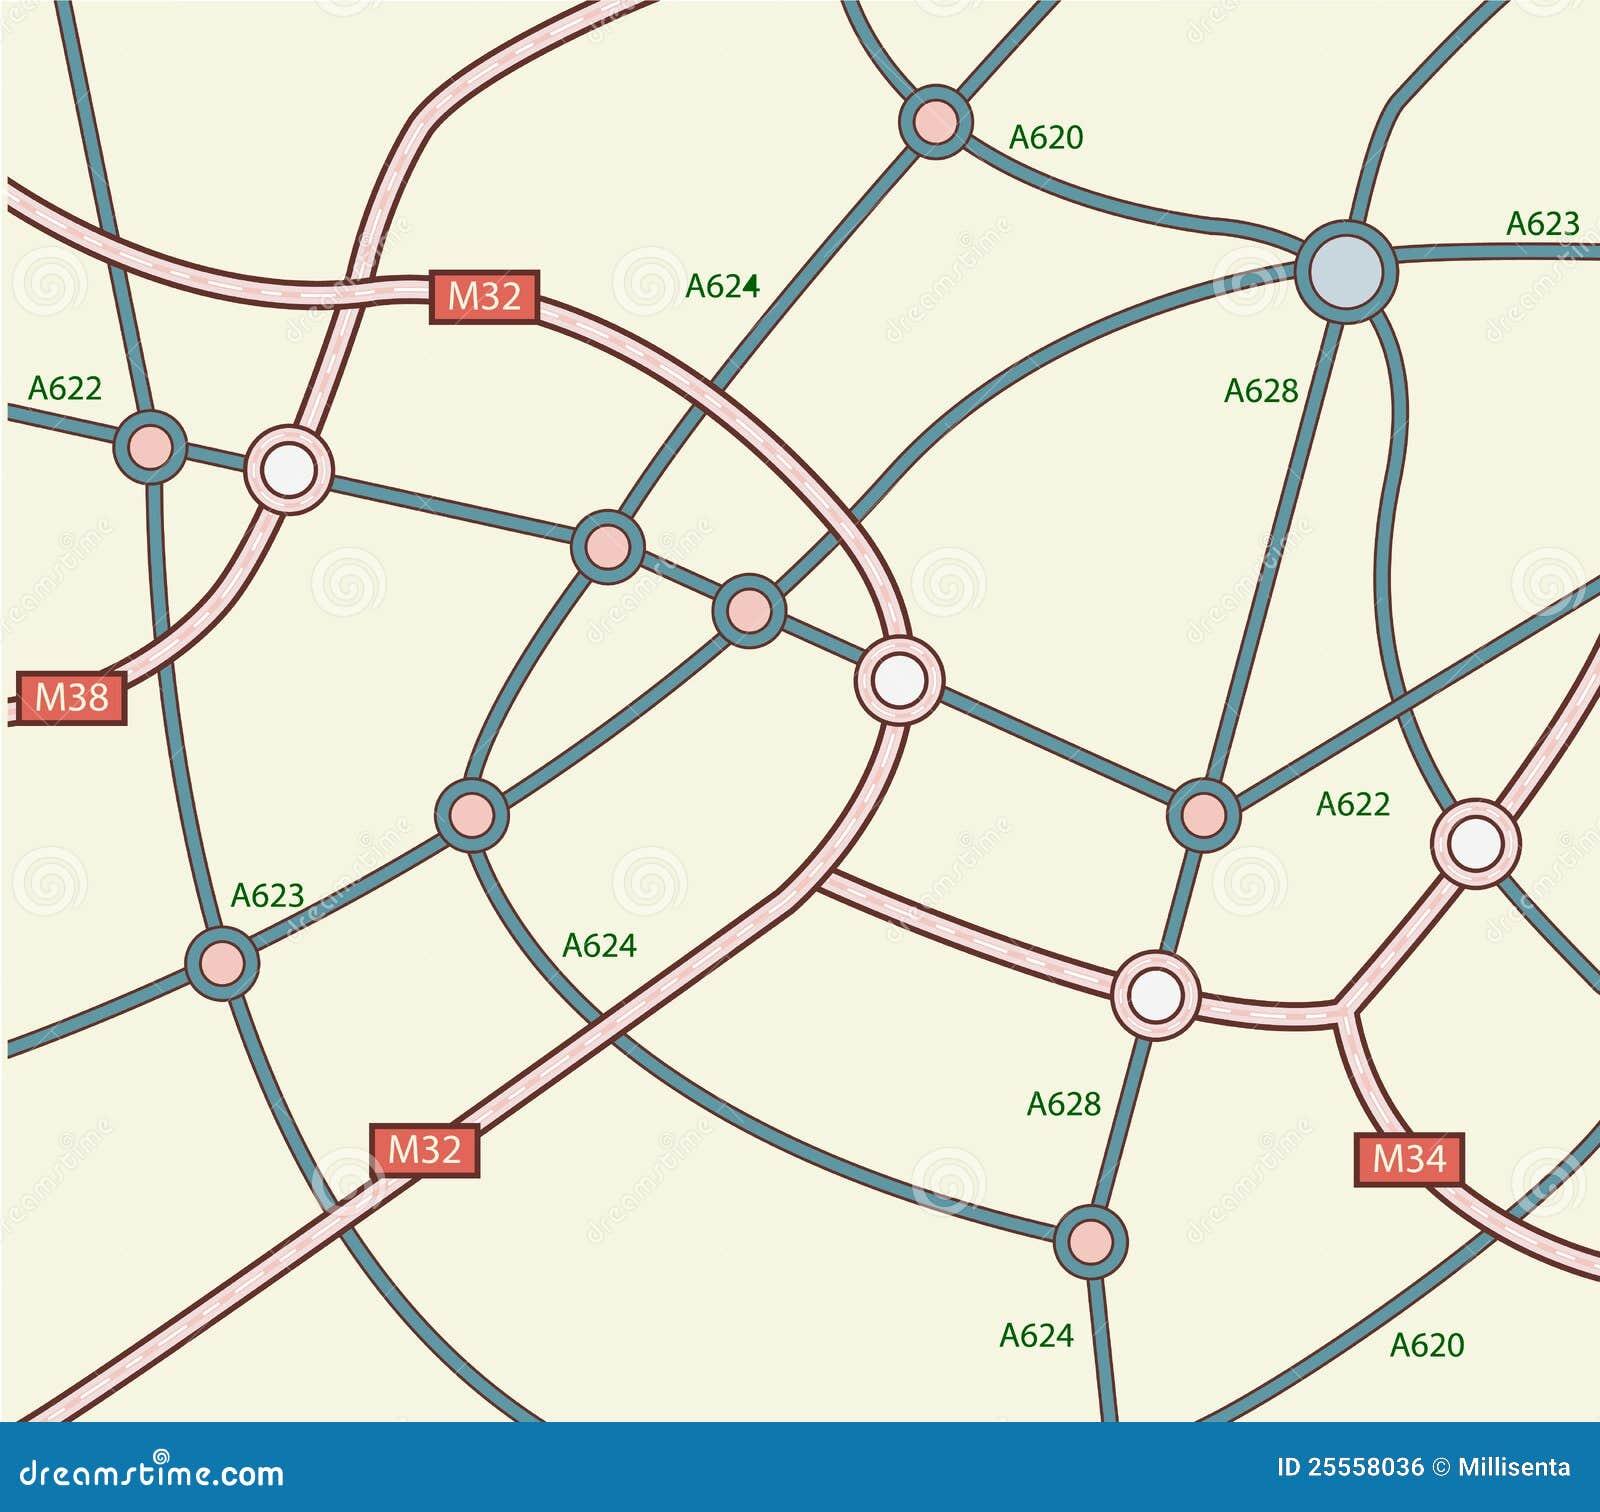 Blank Road Map: Blank Road Map